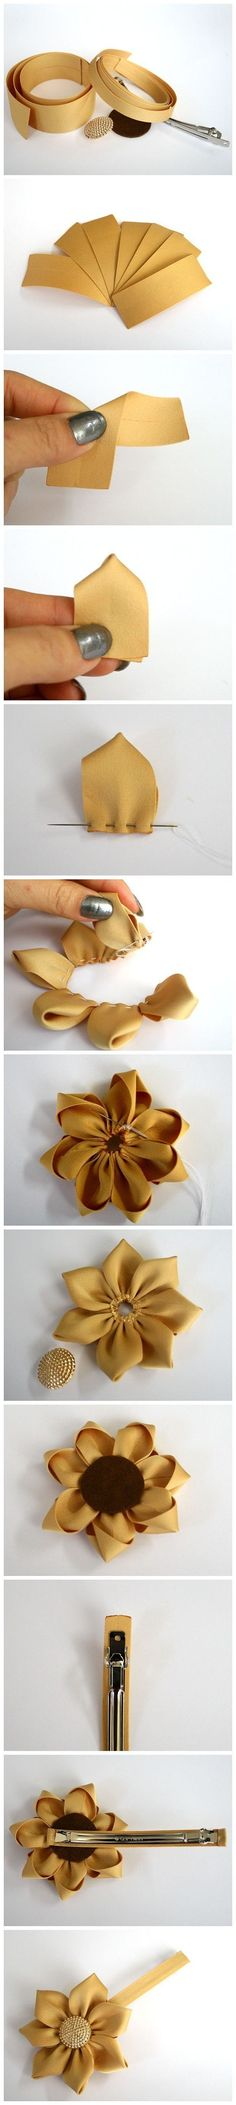 DIY Seven Petals Flower Hairpin DIY Projects